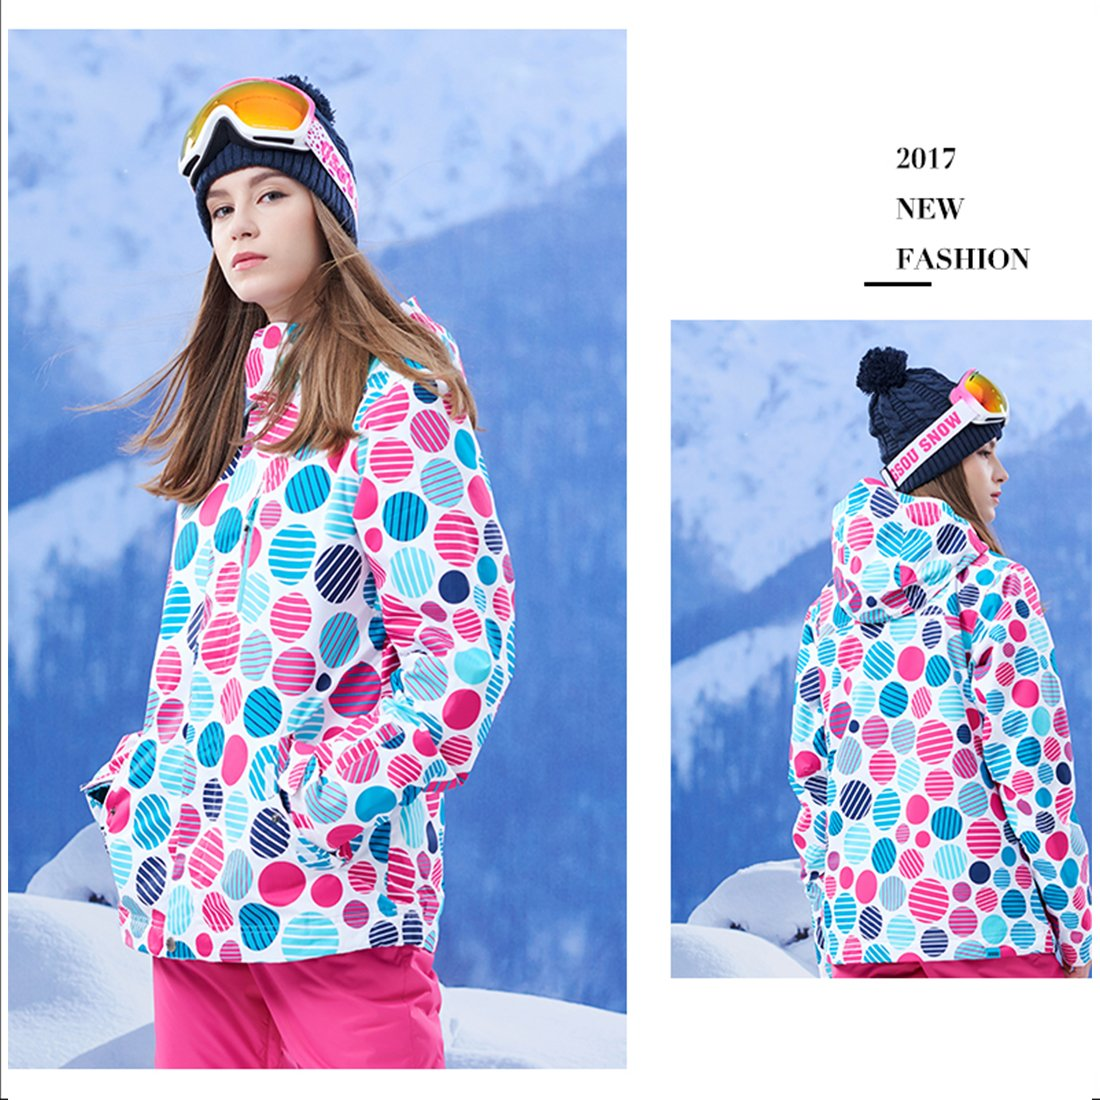 APTRO Women's High Windproof Technology Colorfull Printed Ski Jacket Style #37 Size S by APTRO (Image #4)